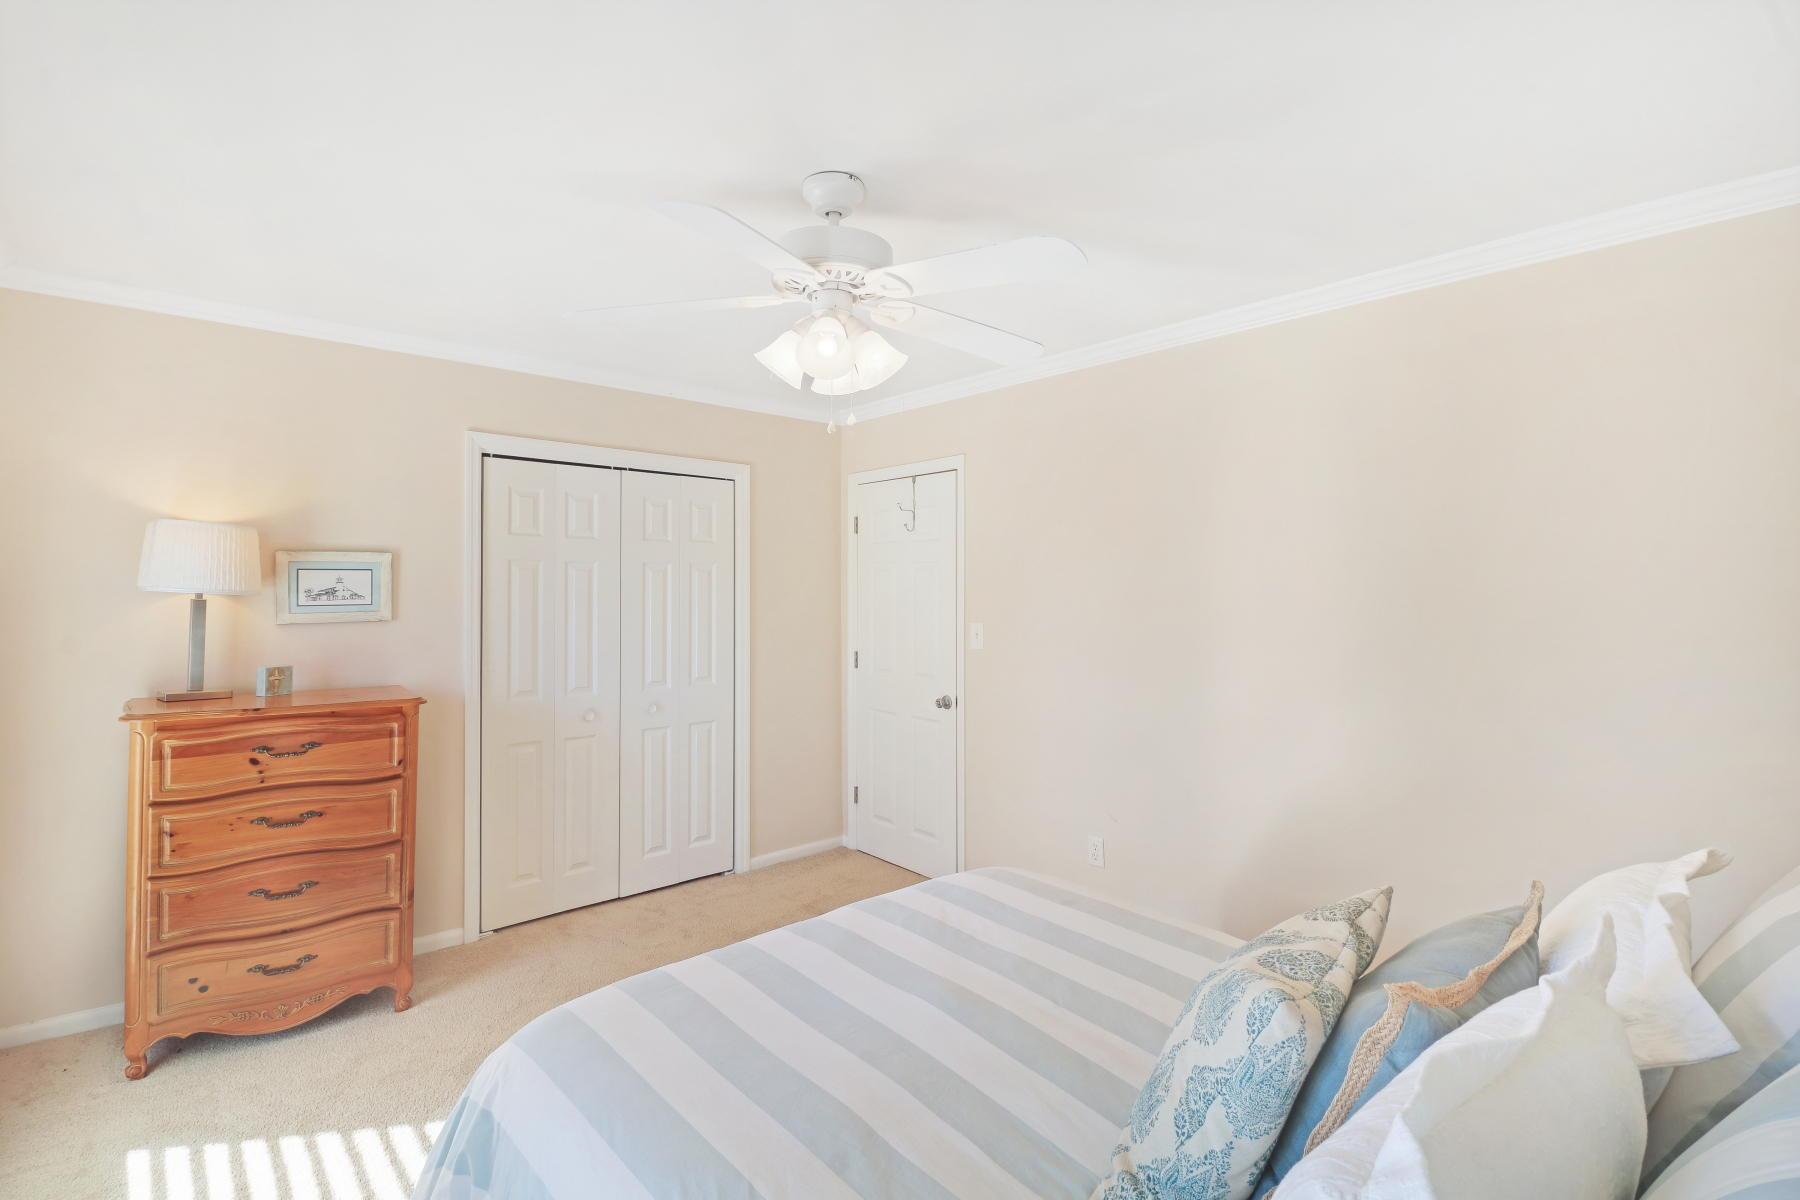 Harrison Acres Homes For Sale - 51 Markfield, Charleston, SC - 17